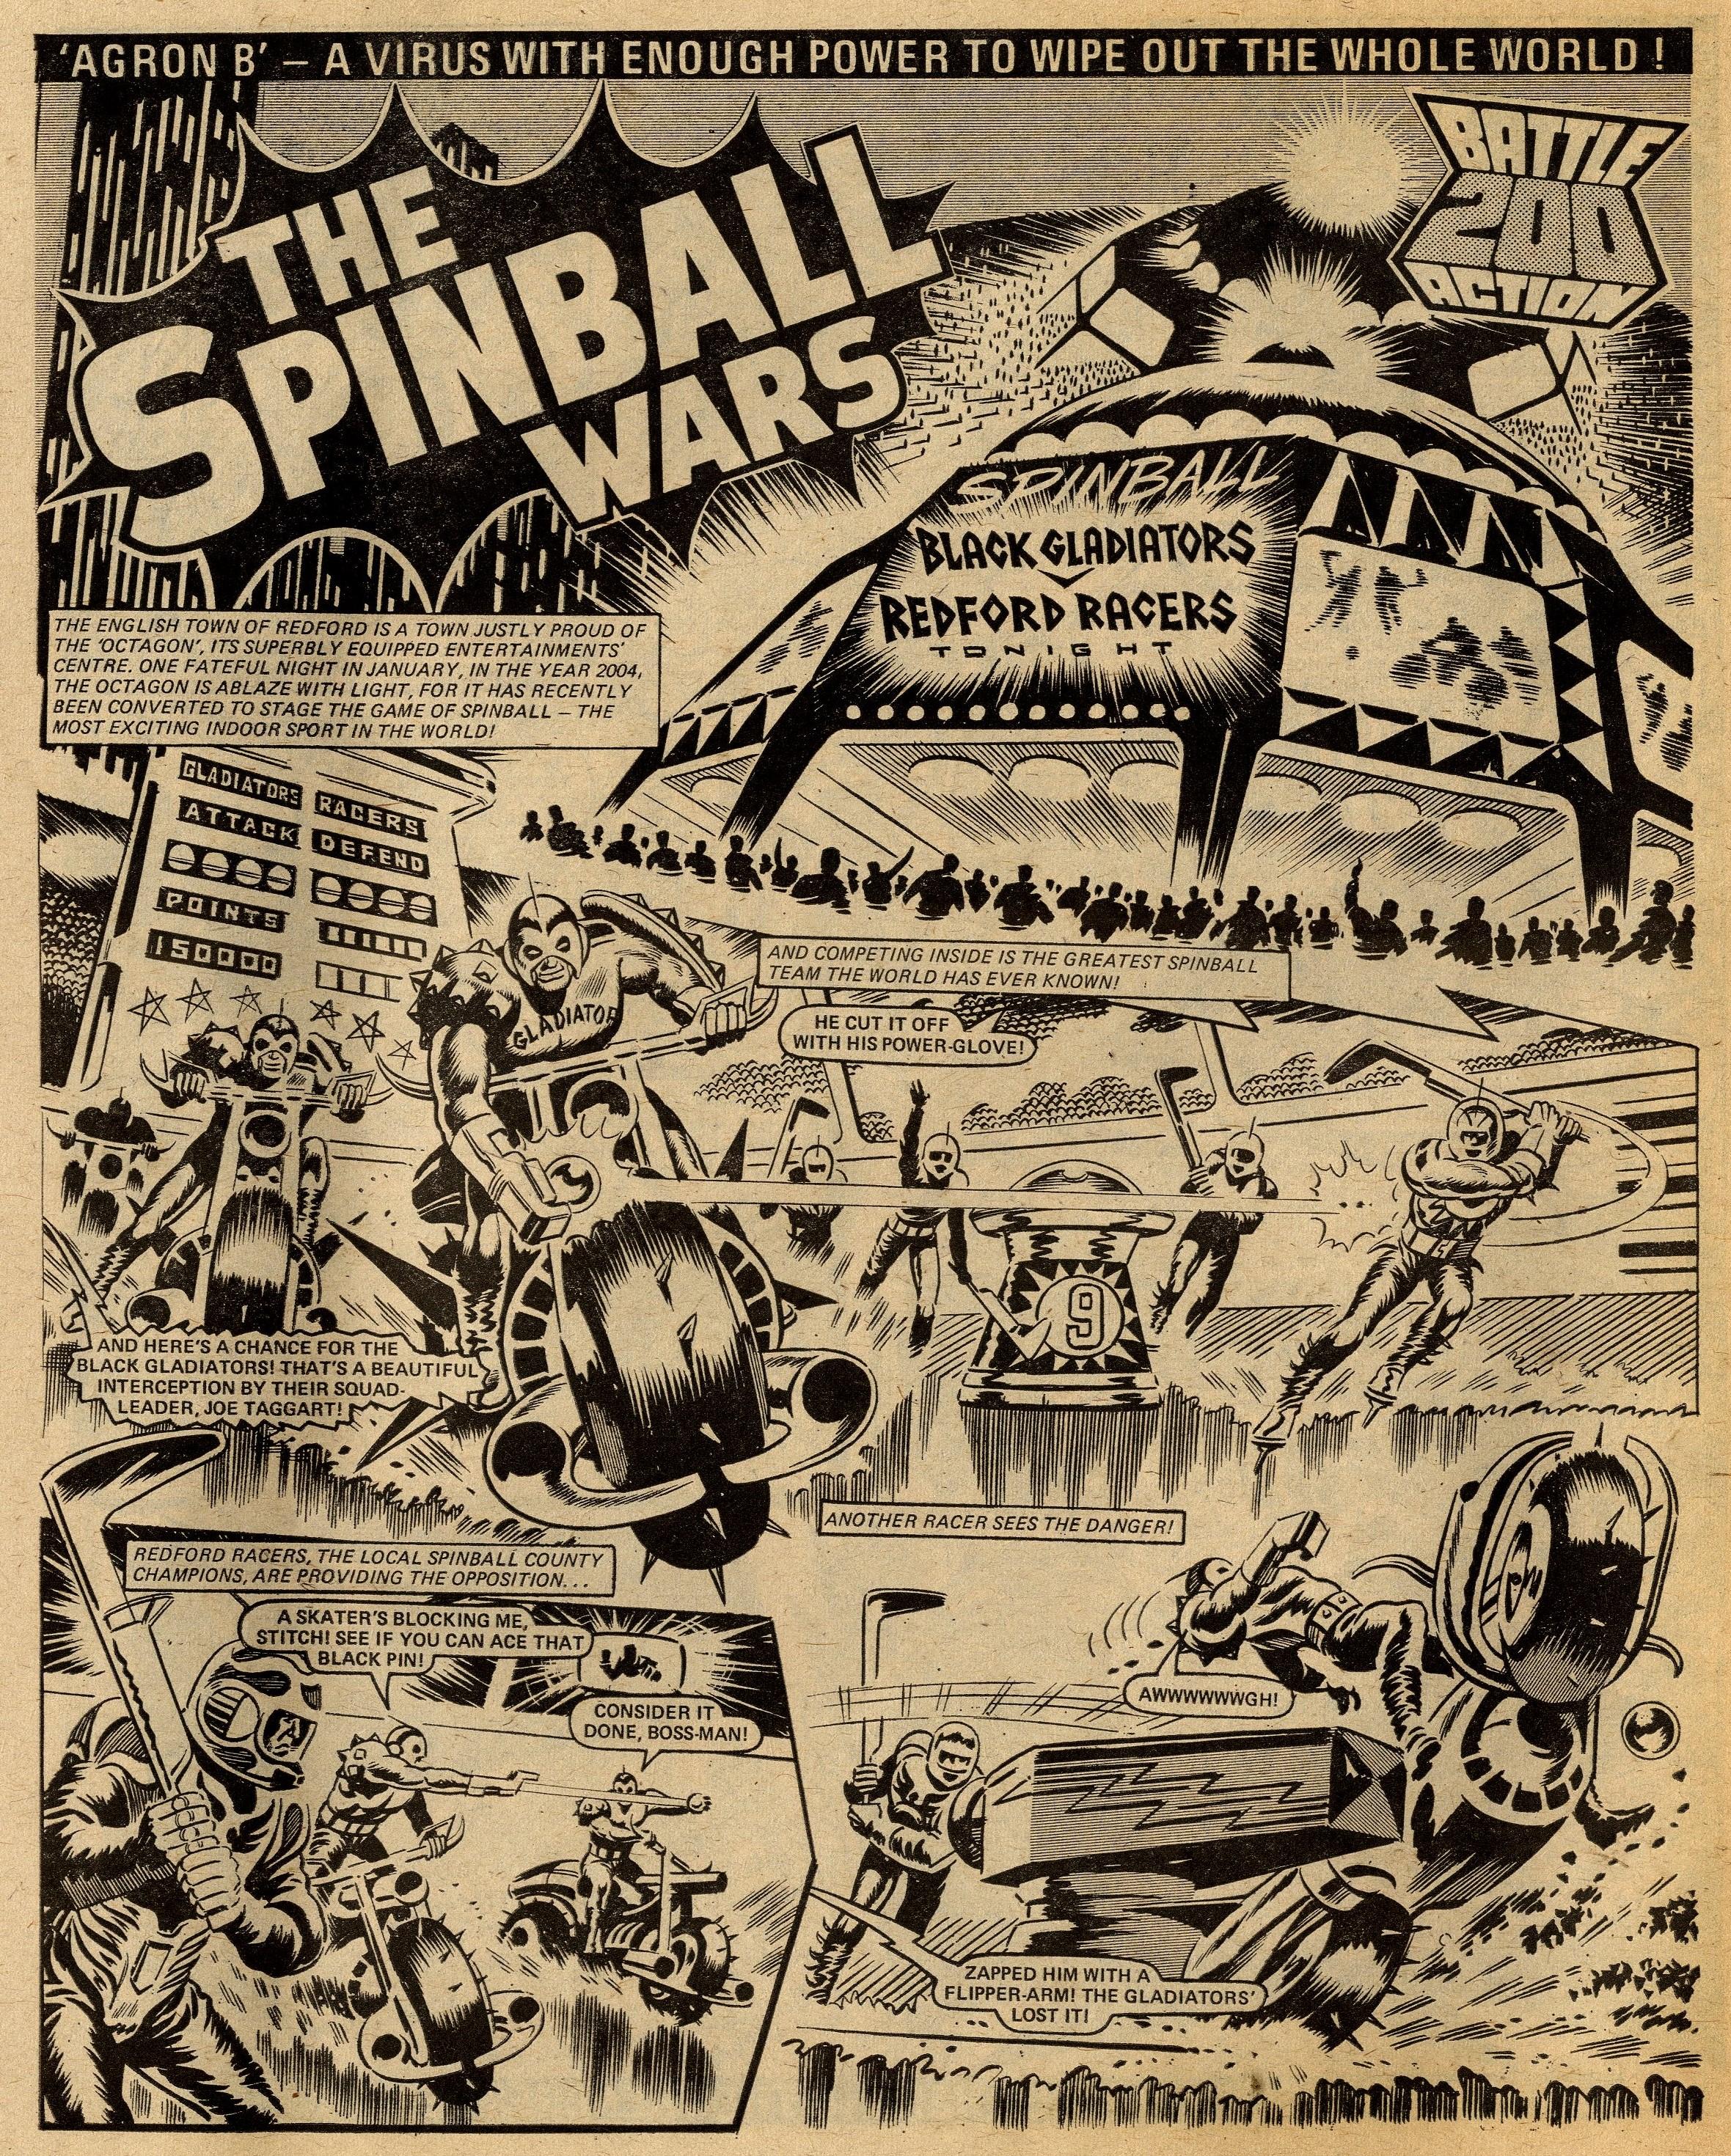 The Spinball Wars: Tom Tully (writer), Ron Turner (artist)